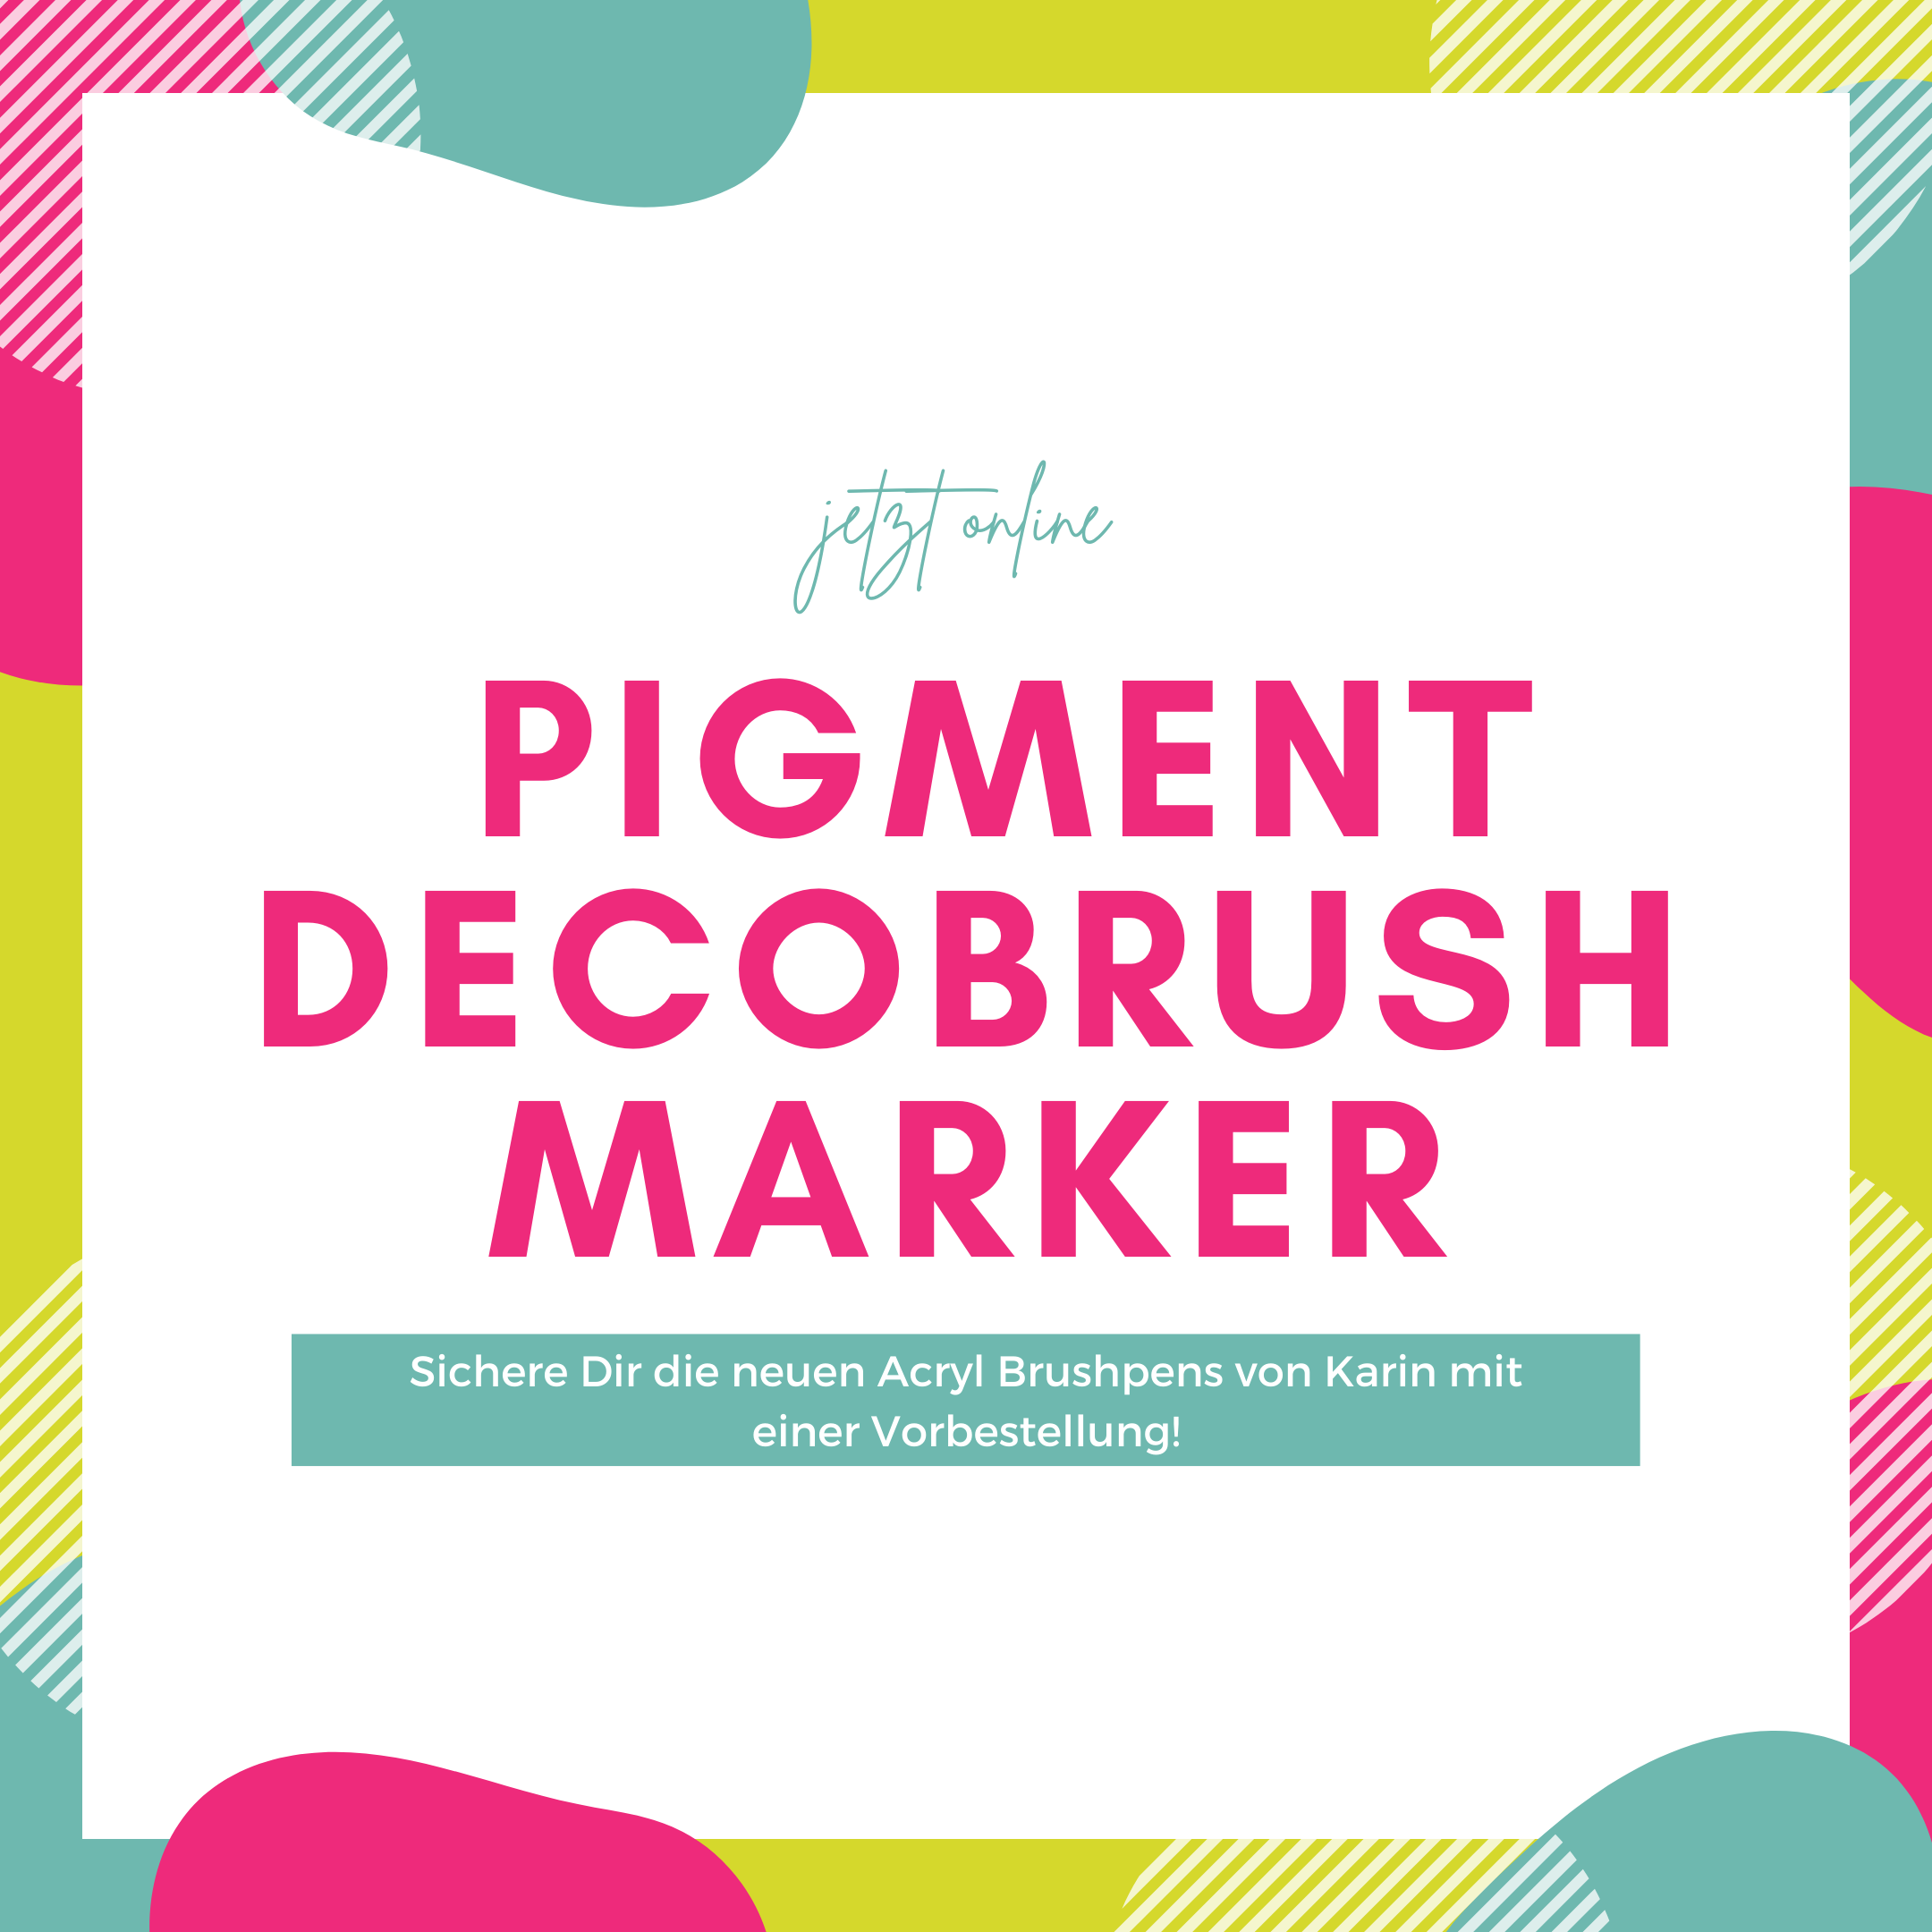 Pigment DecoBrush Marker